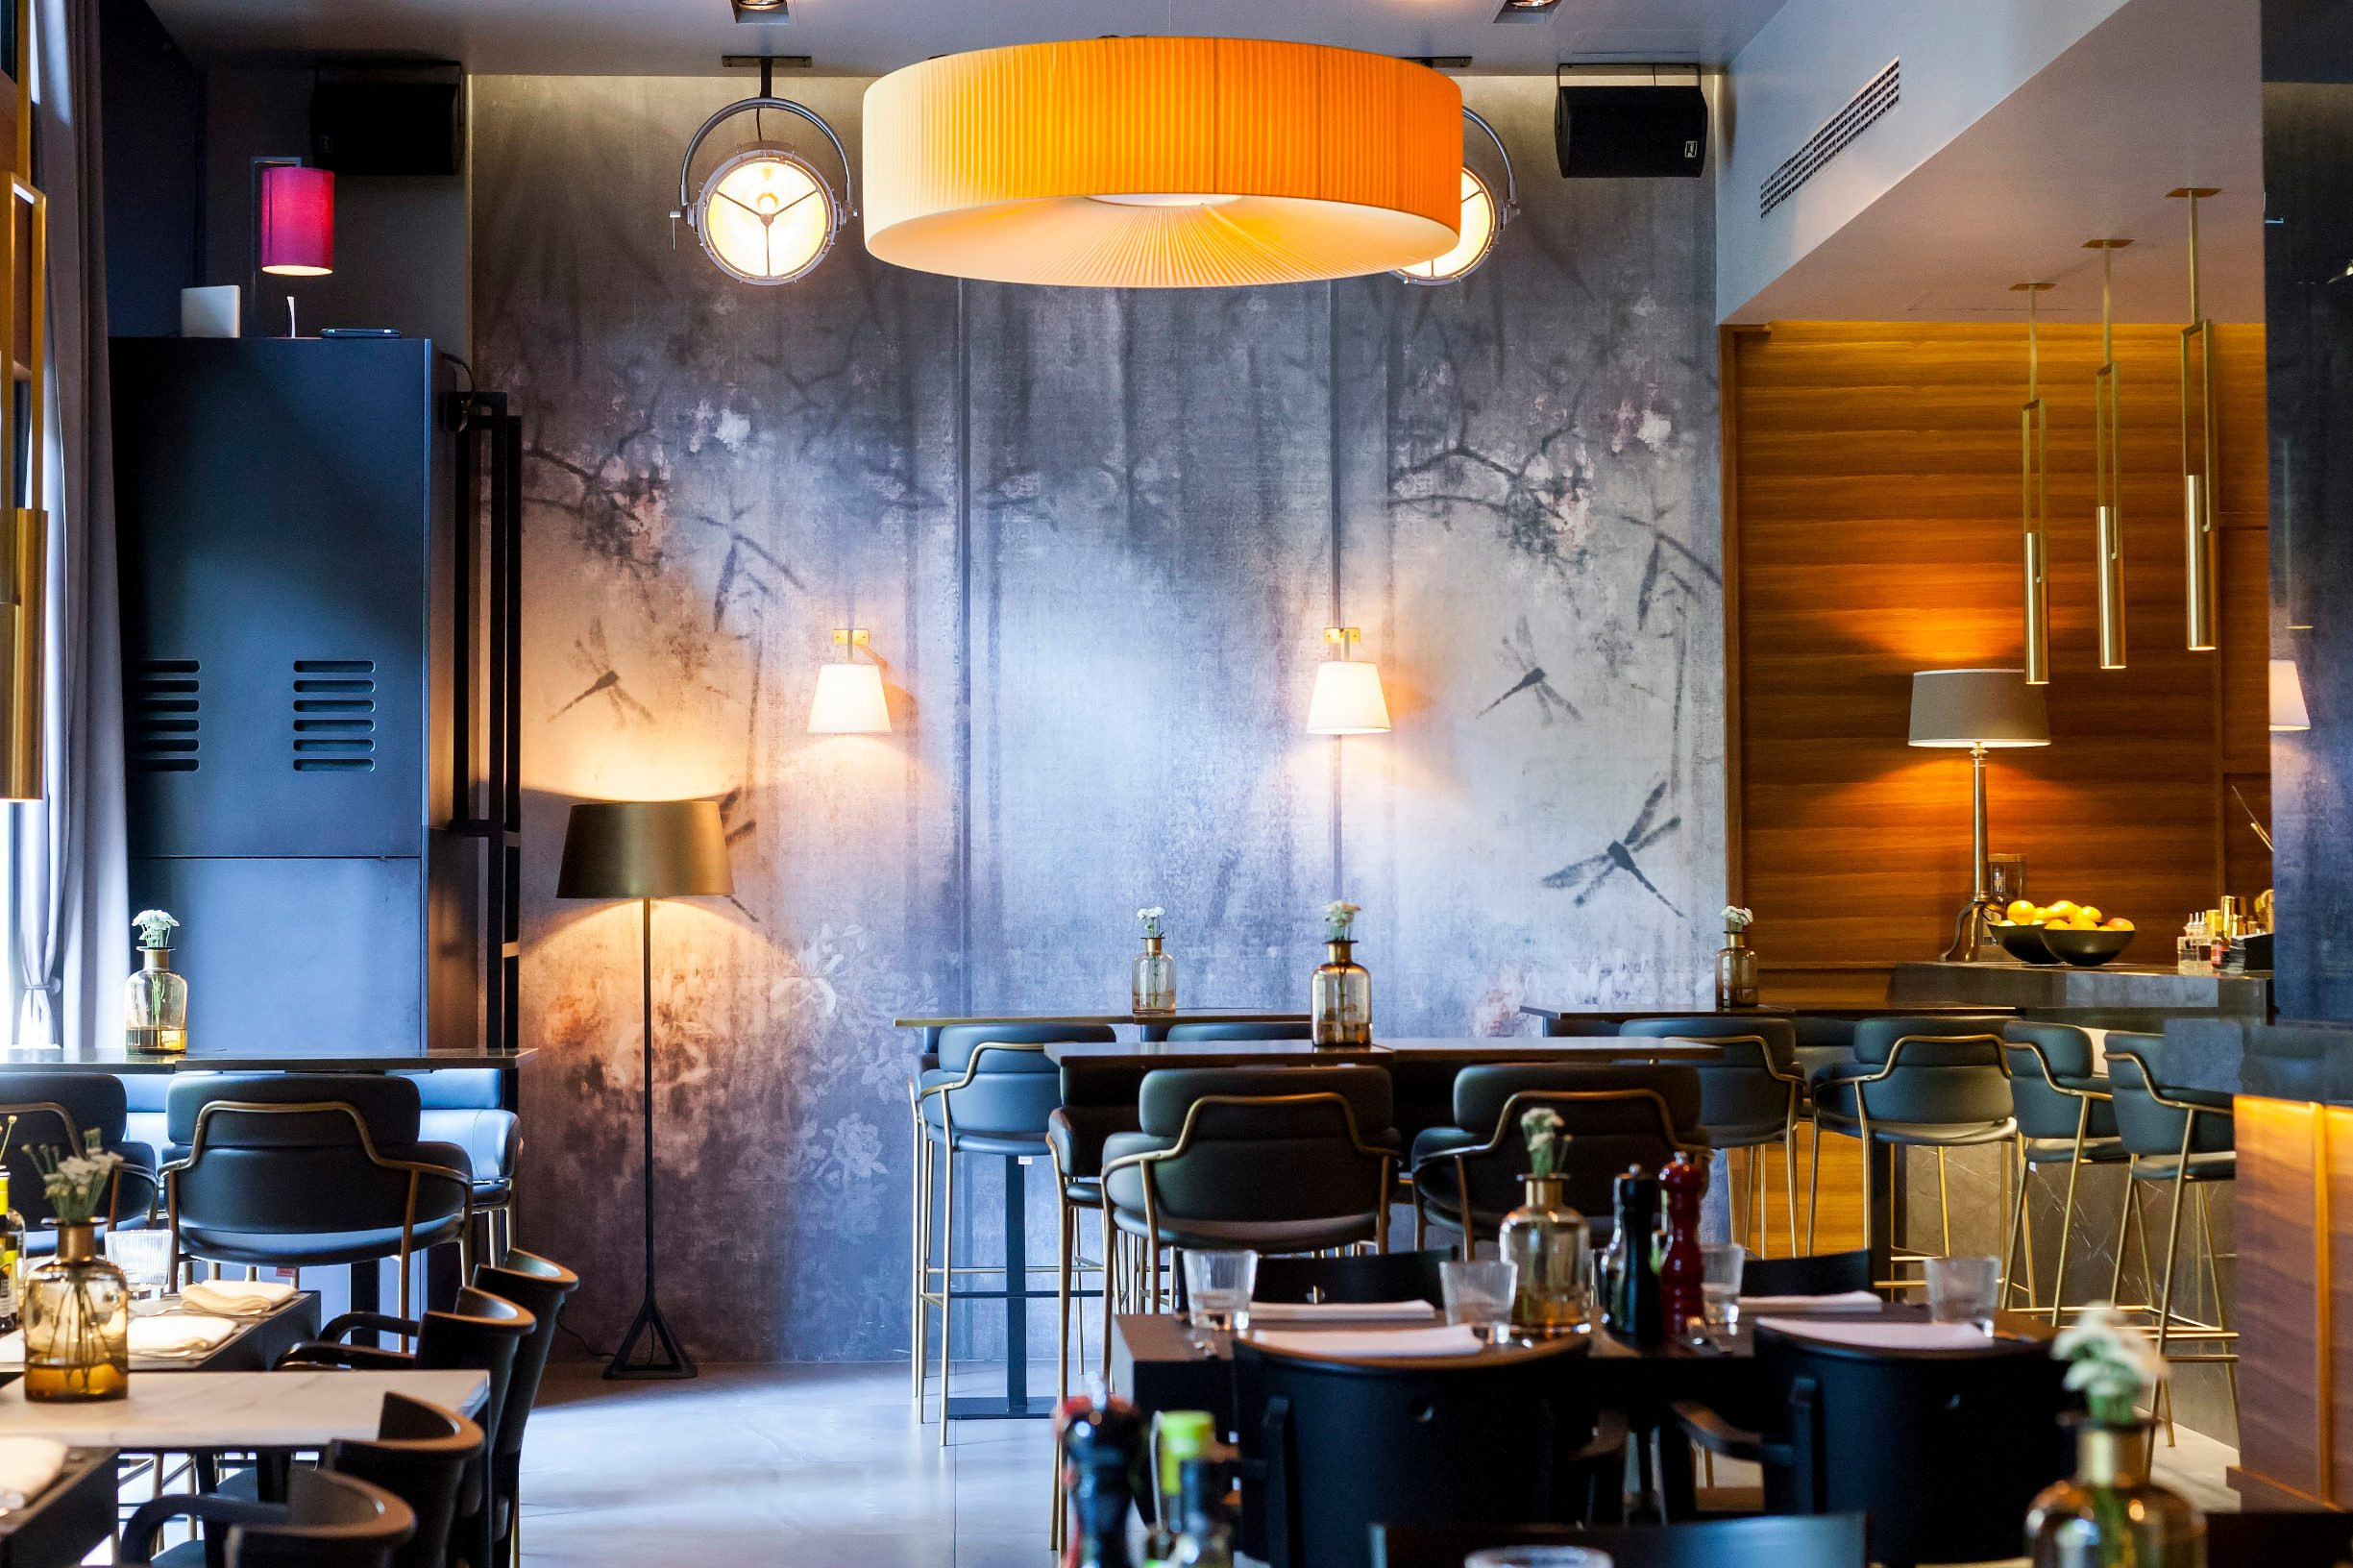 Zagreb, 091018. Kaptol centar. Restoran Barbieris. Na fotografiji: interijer. Foto: Tomislav Kristo / CROPIX